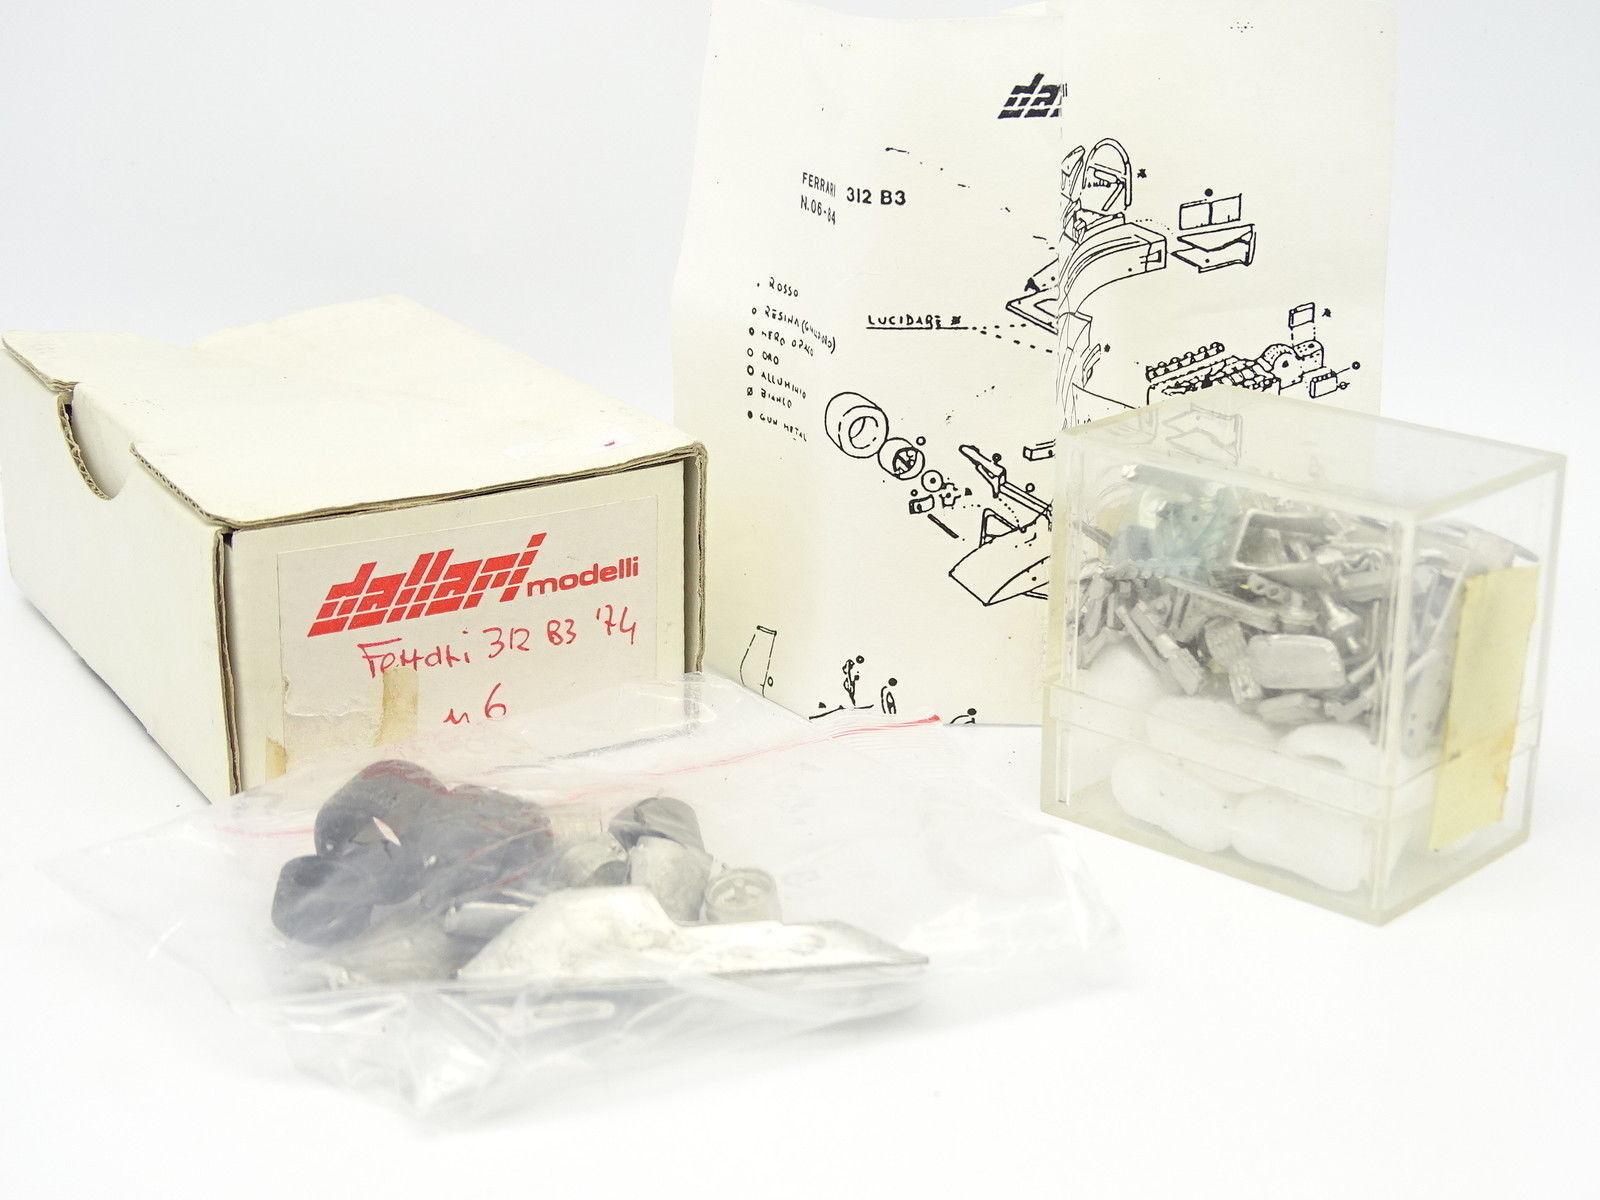 Dallari Kit à Monter 1 43 - Ferrari F1 312 B3 1974